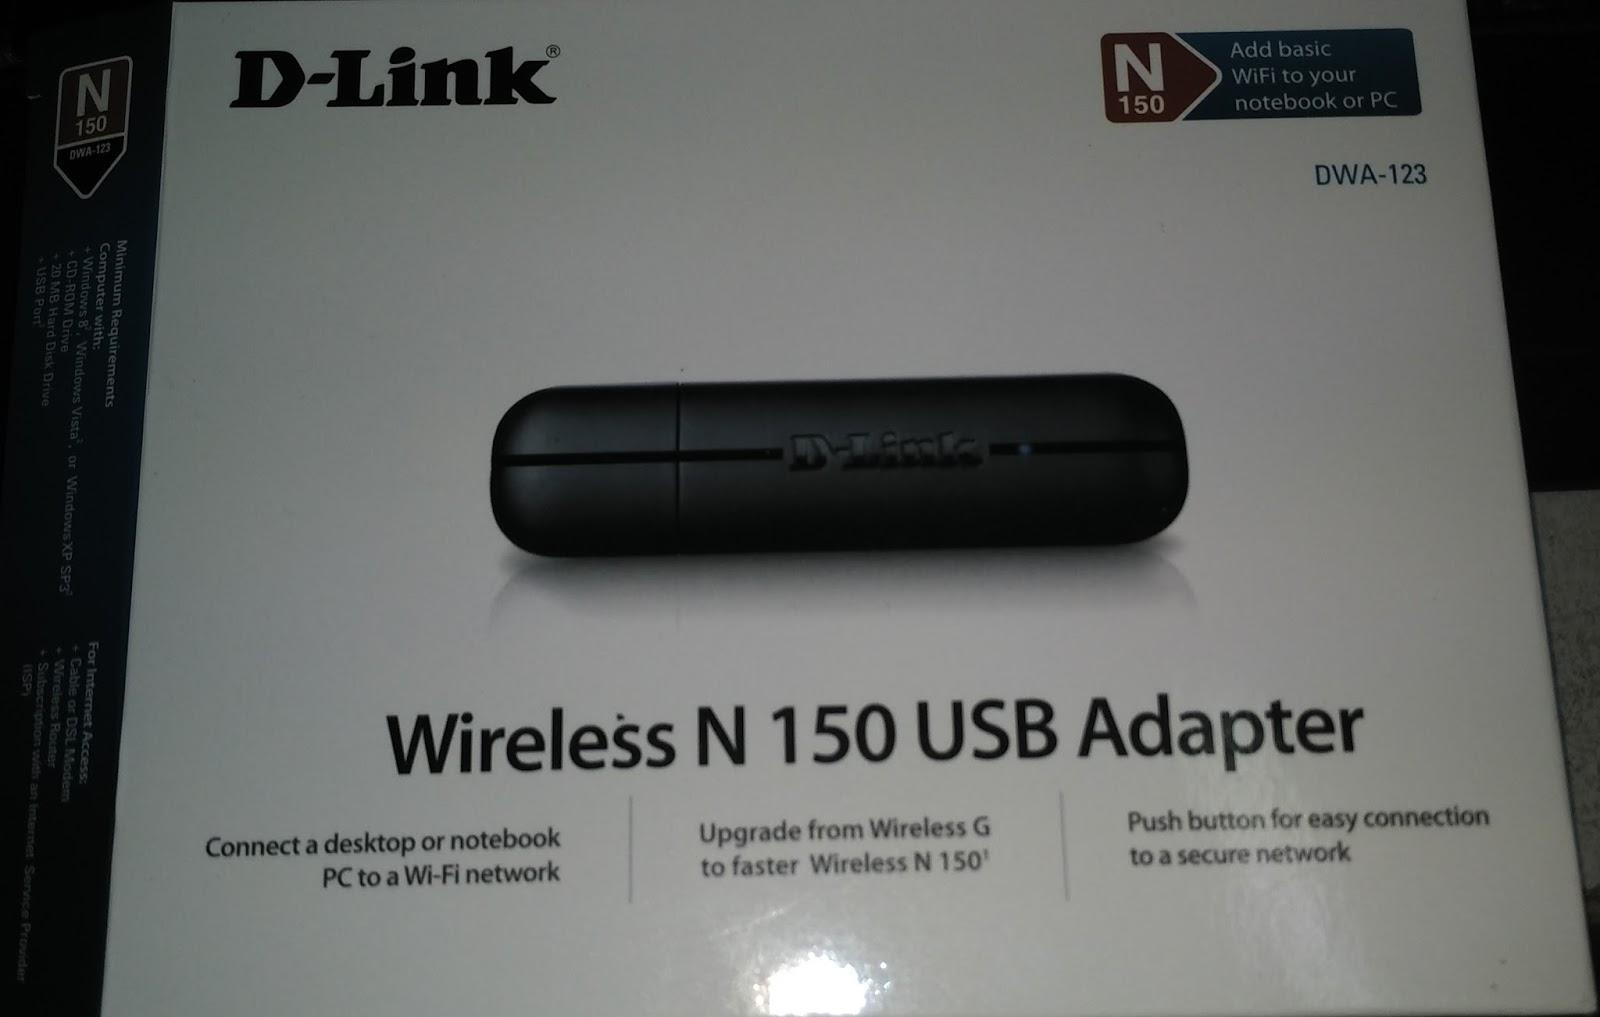 n150 wireless usb adapter setup